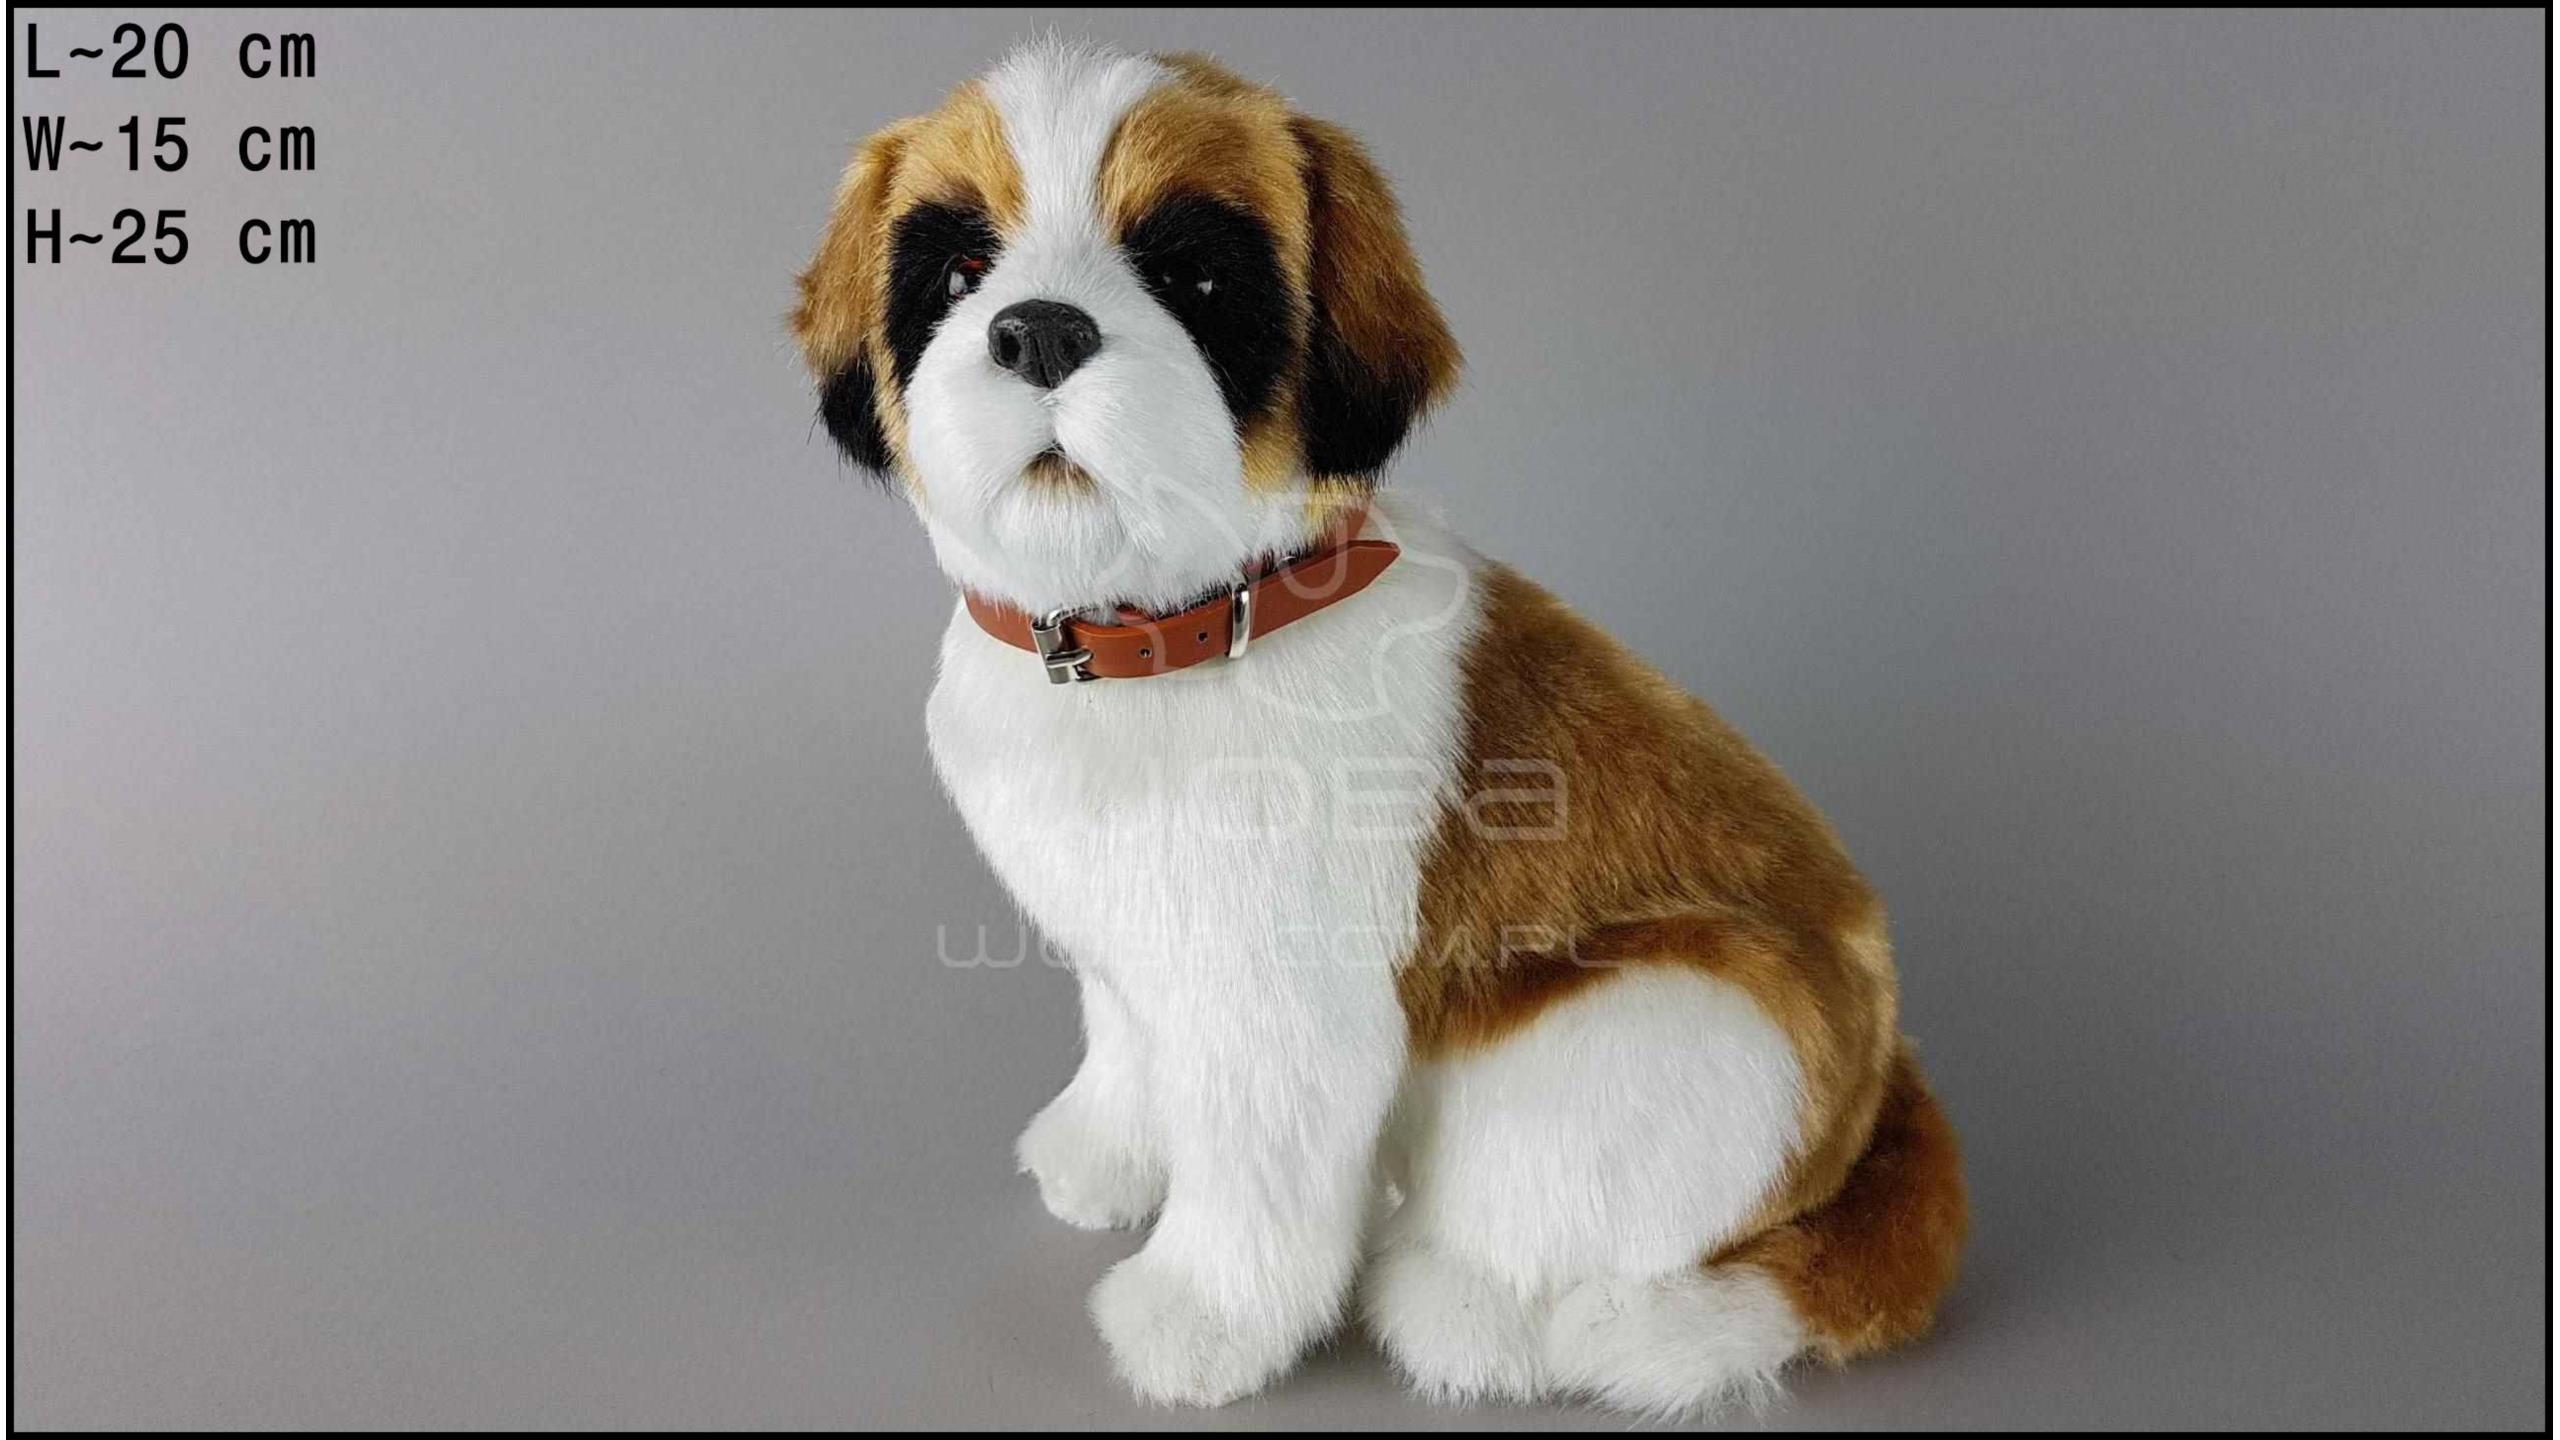 Pies duży - Bernardyn